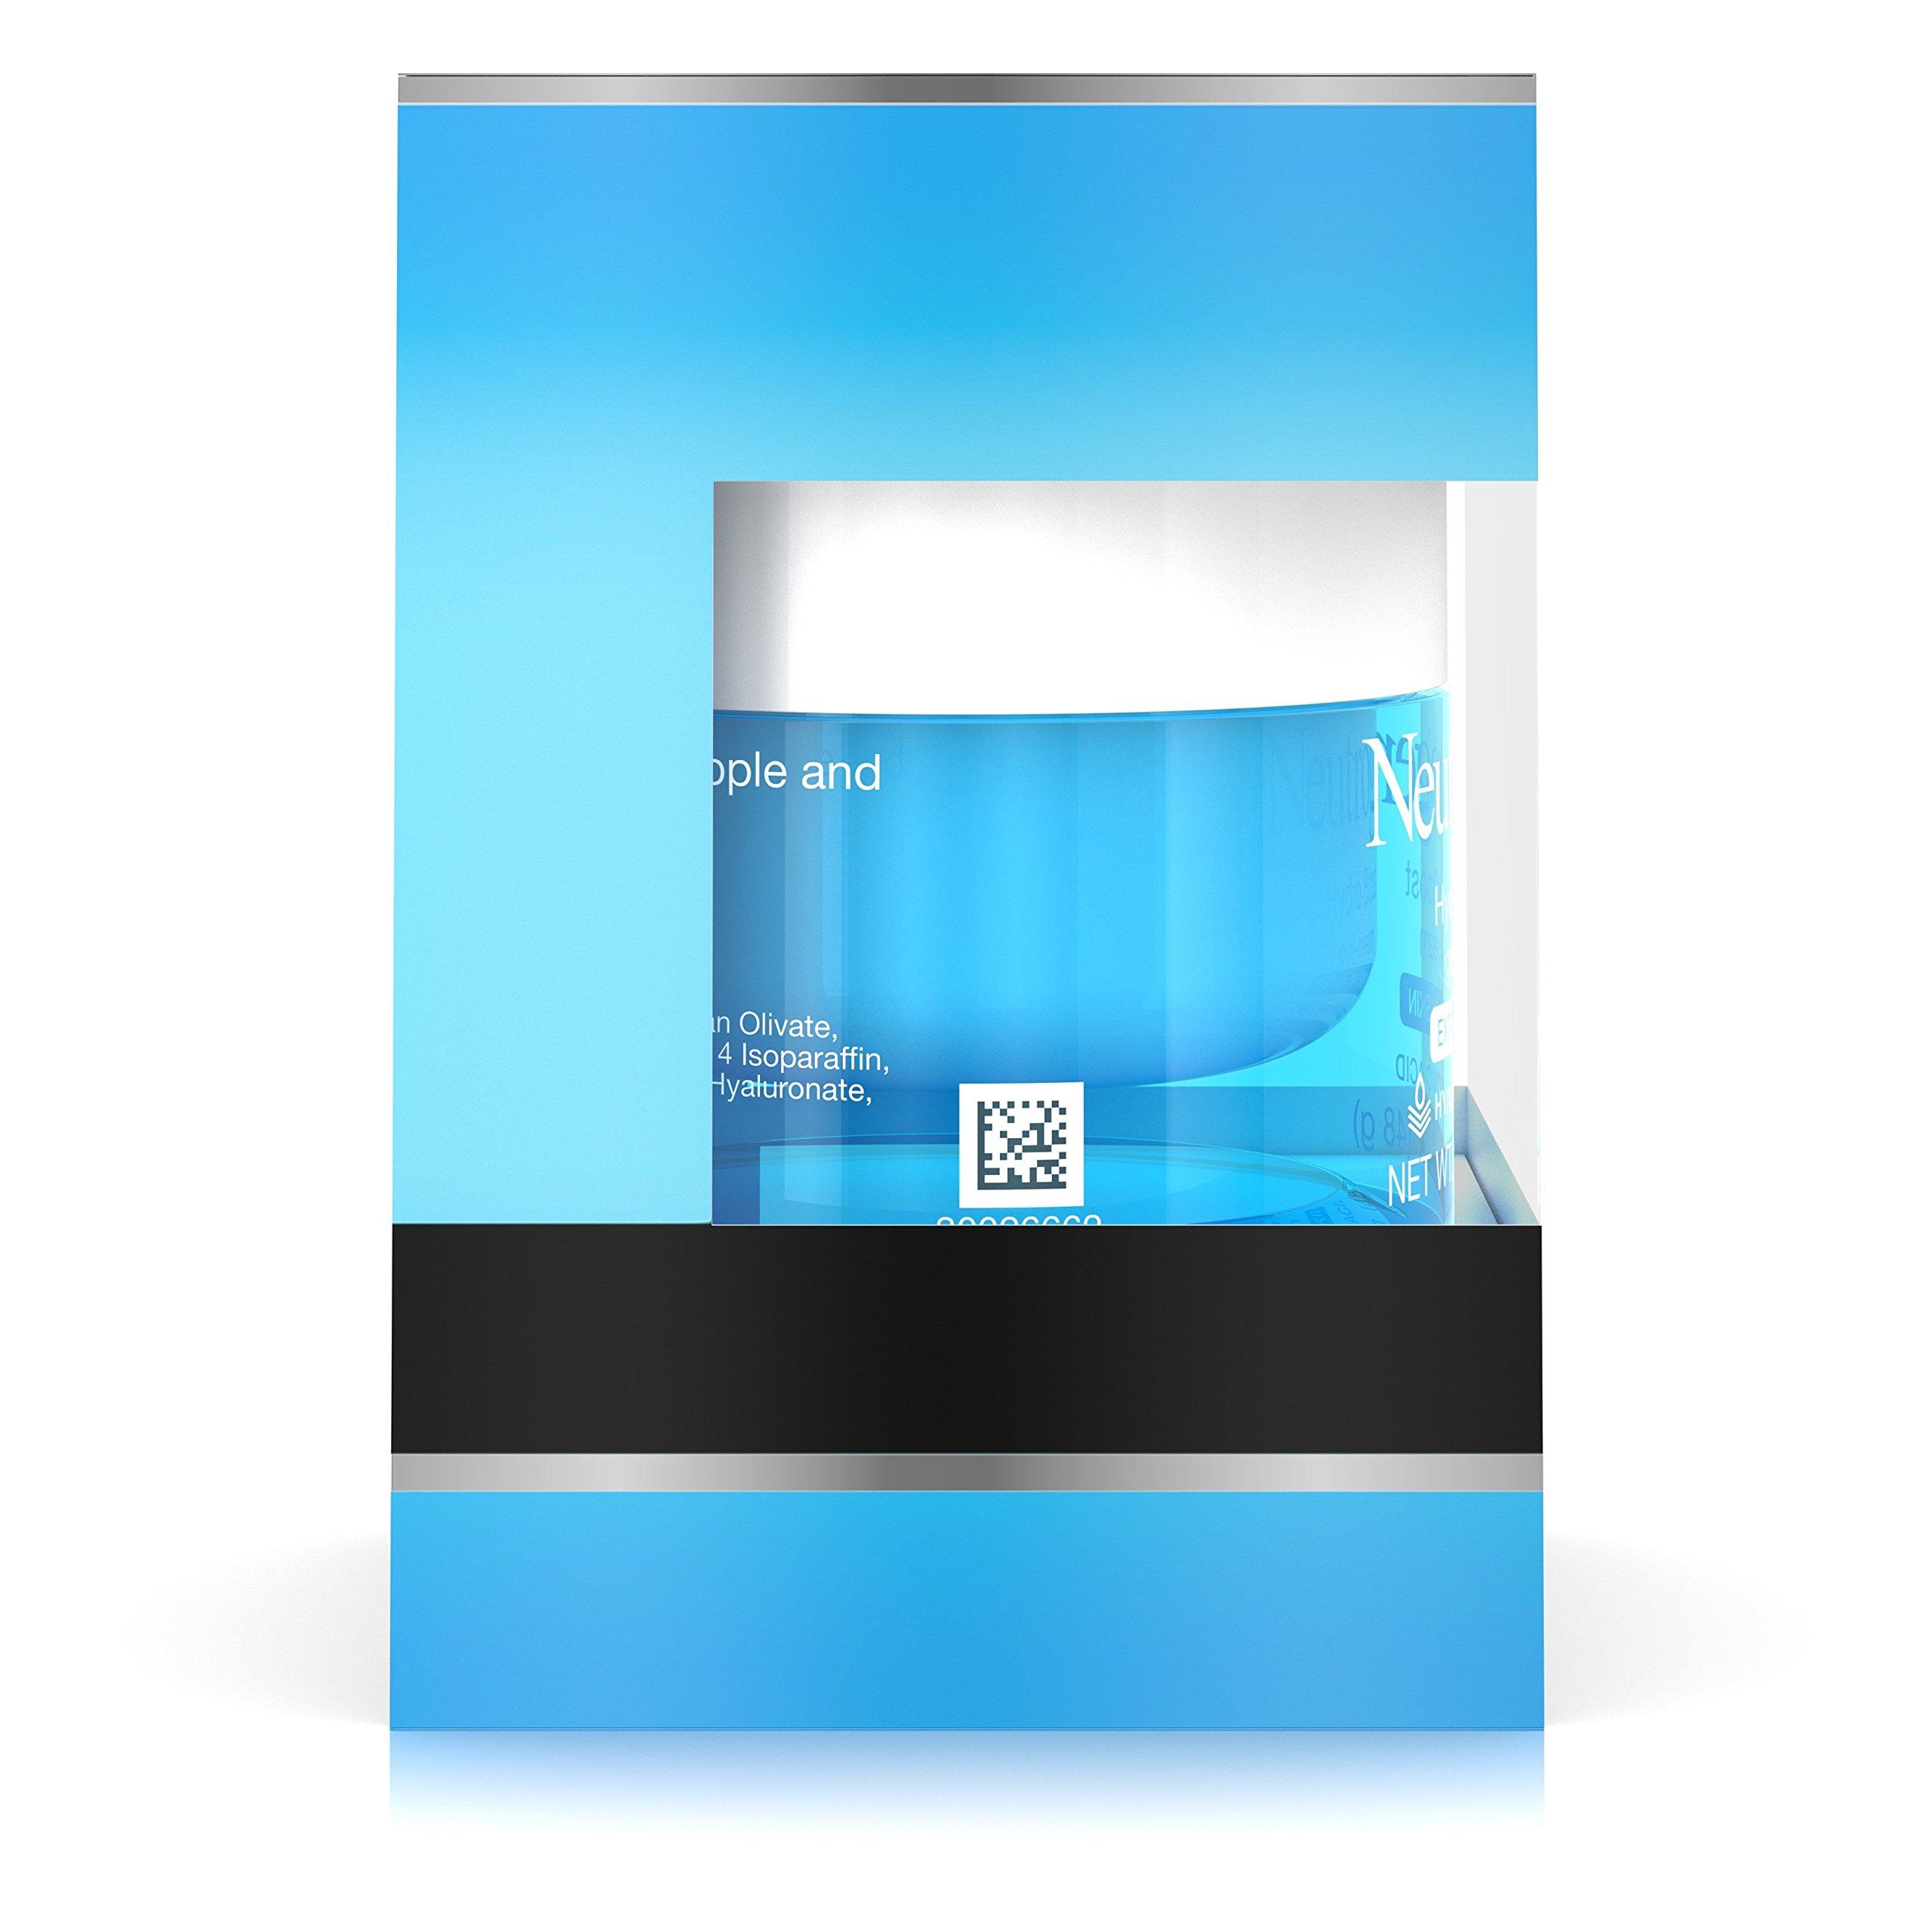 Neutrogena Hydro Boost Hyaluronic Acid Hydrating Face Moisturizer Gel-Cream to Hydrate and Smooth Extra-Dry Skin, 1.7 oz by Neutrogena (Image #7)